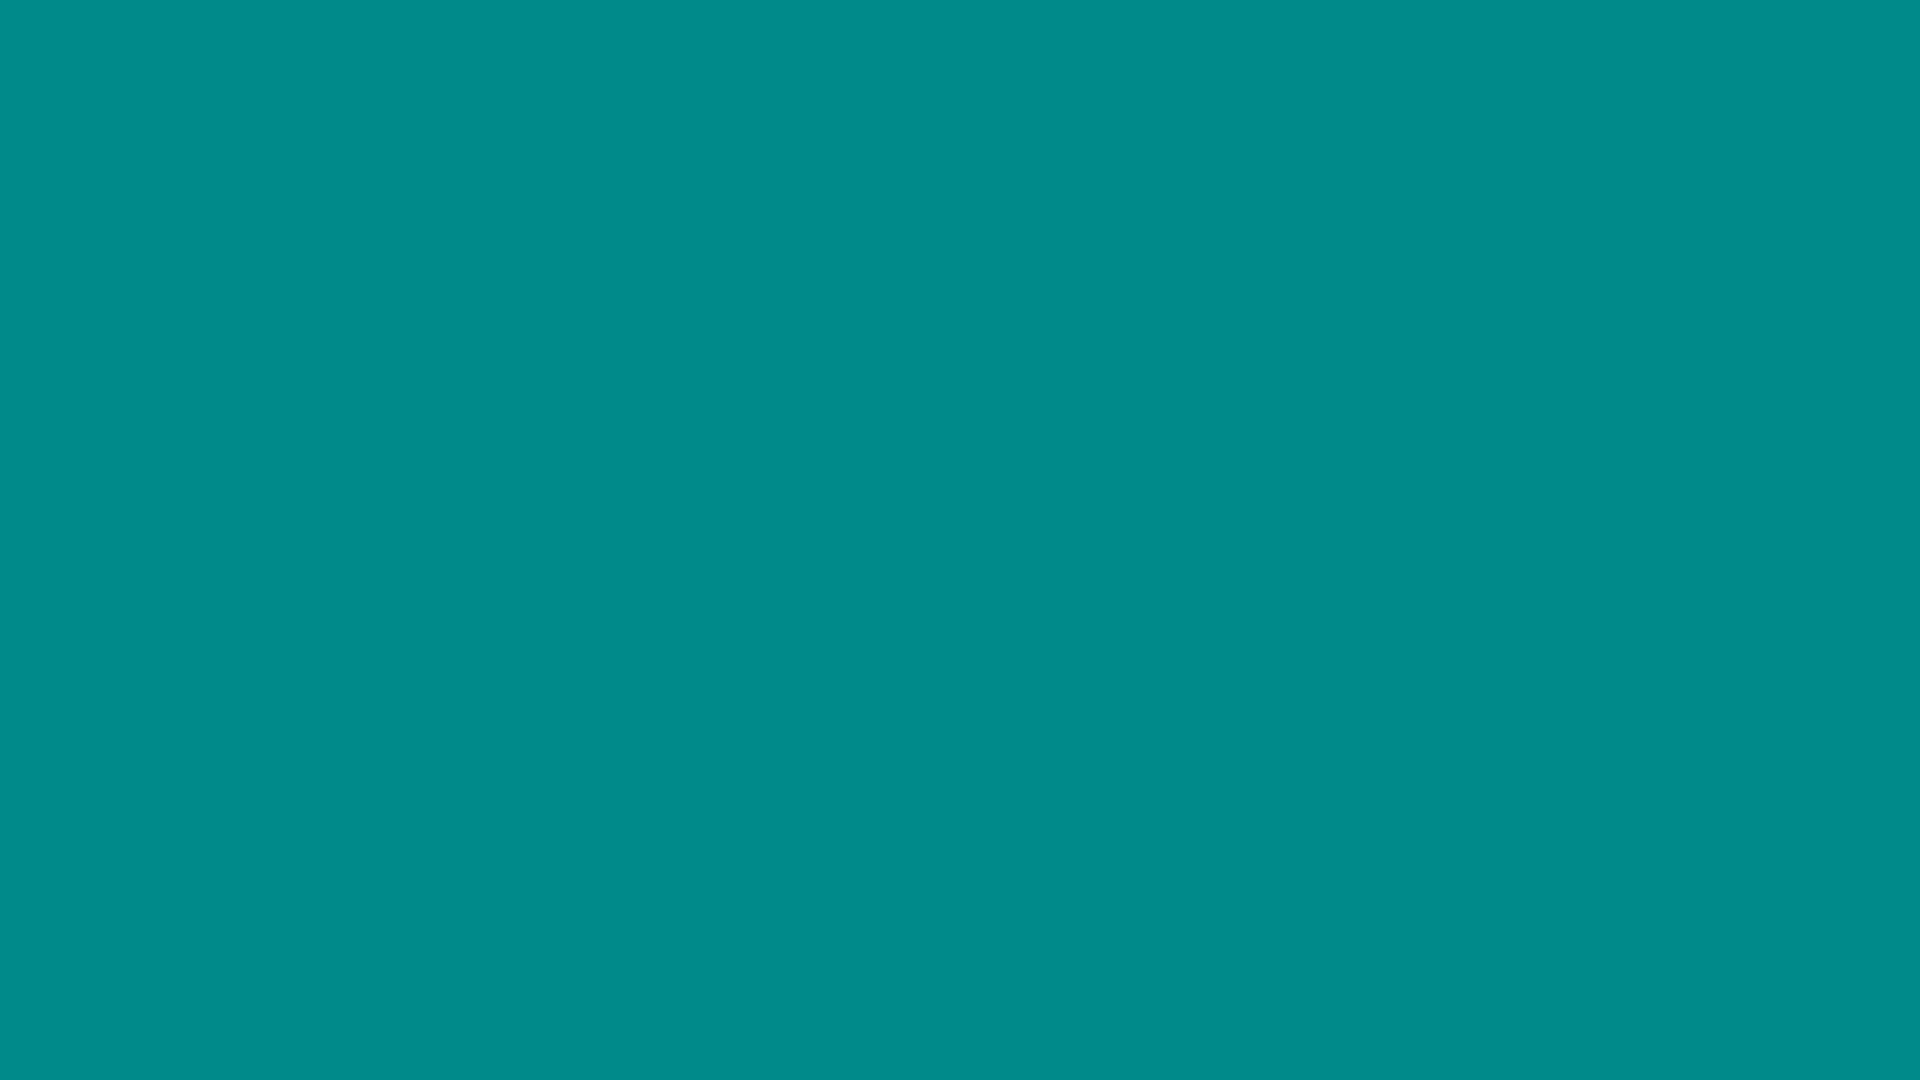 1920x1080 Dark Cyan Solid Color Background